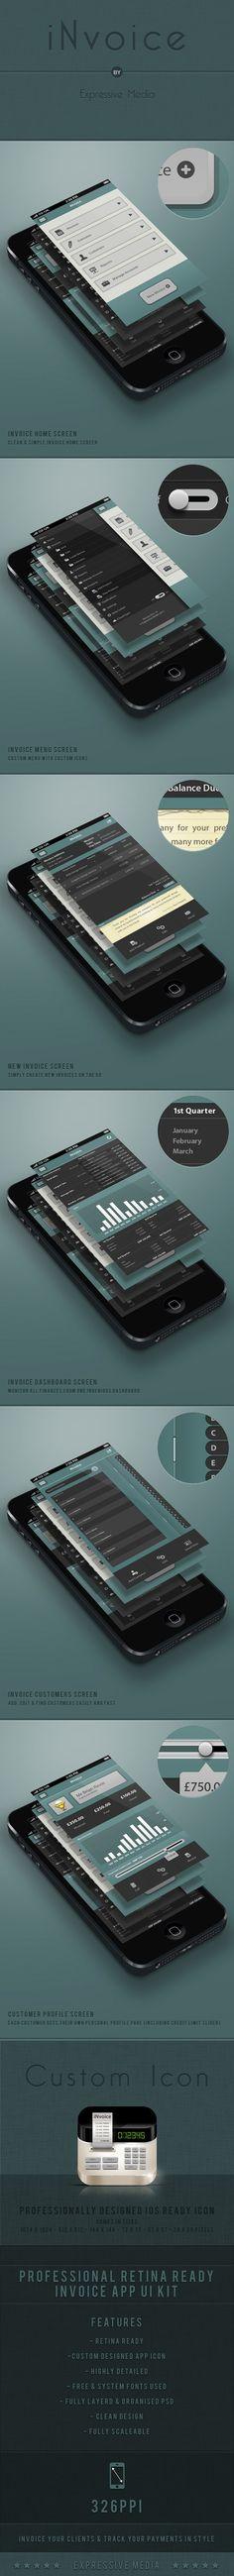 iNvoice by Expressive Media, via Behance